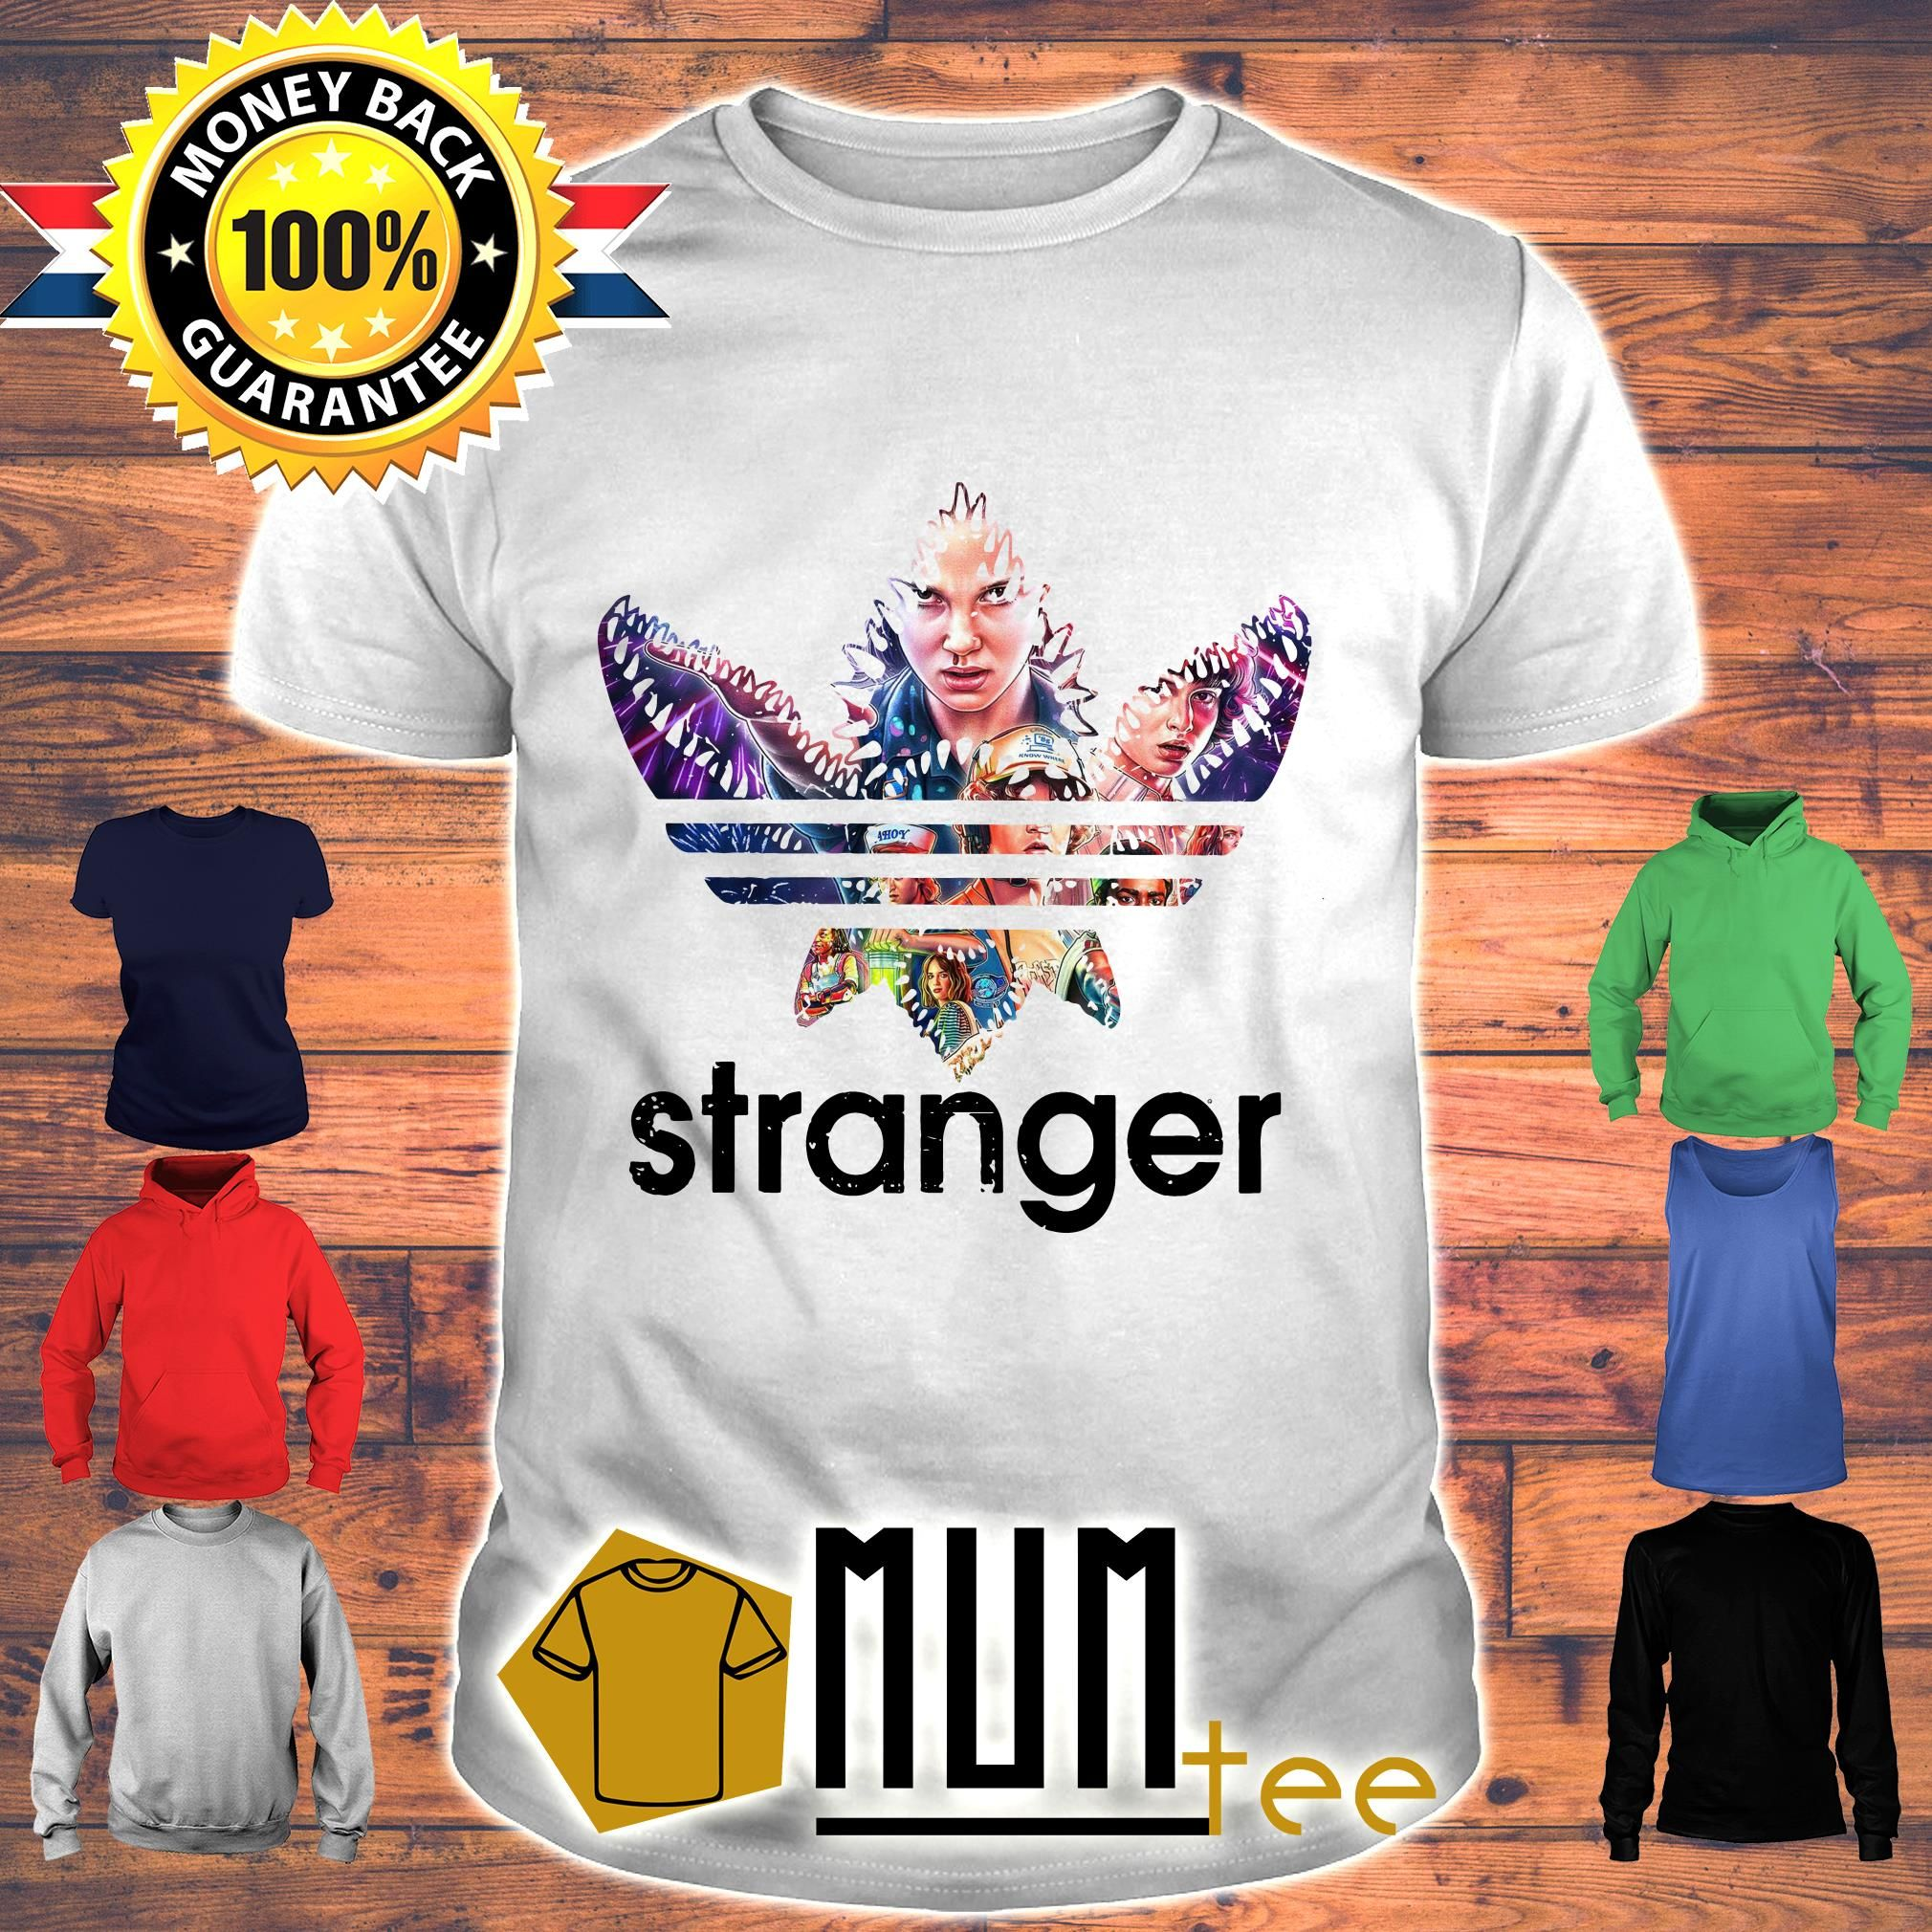 Fast Shipping Stranger Things Poster Adidas Demogorgon Shirt Tank Top V Neck Sweater And Hoodie Mumtee Stranger Things Poster Friends Shirt Sweater Hoodie [ 2020 x 2020 Pixel ]